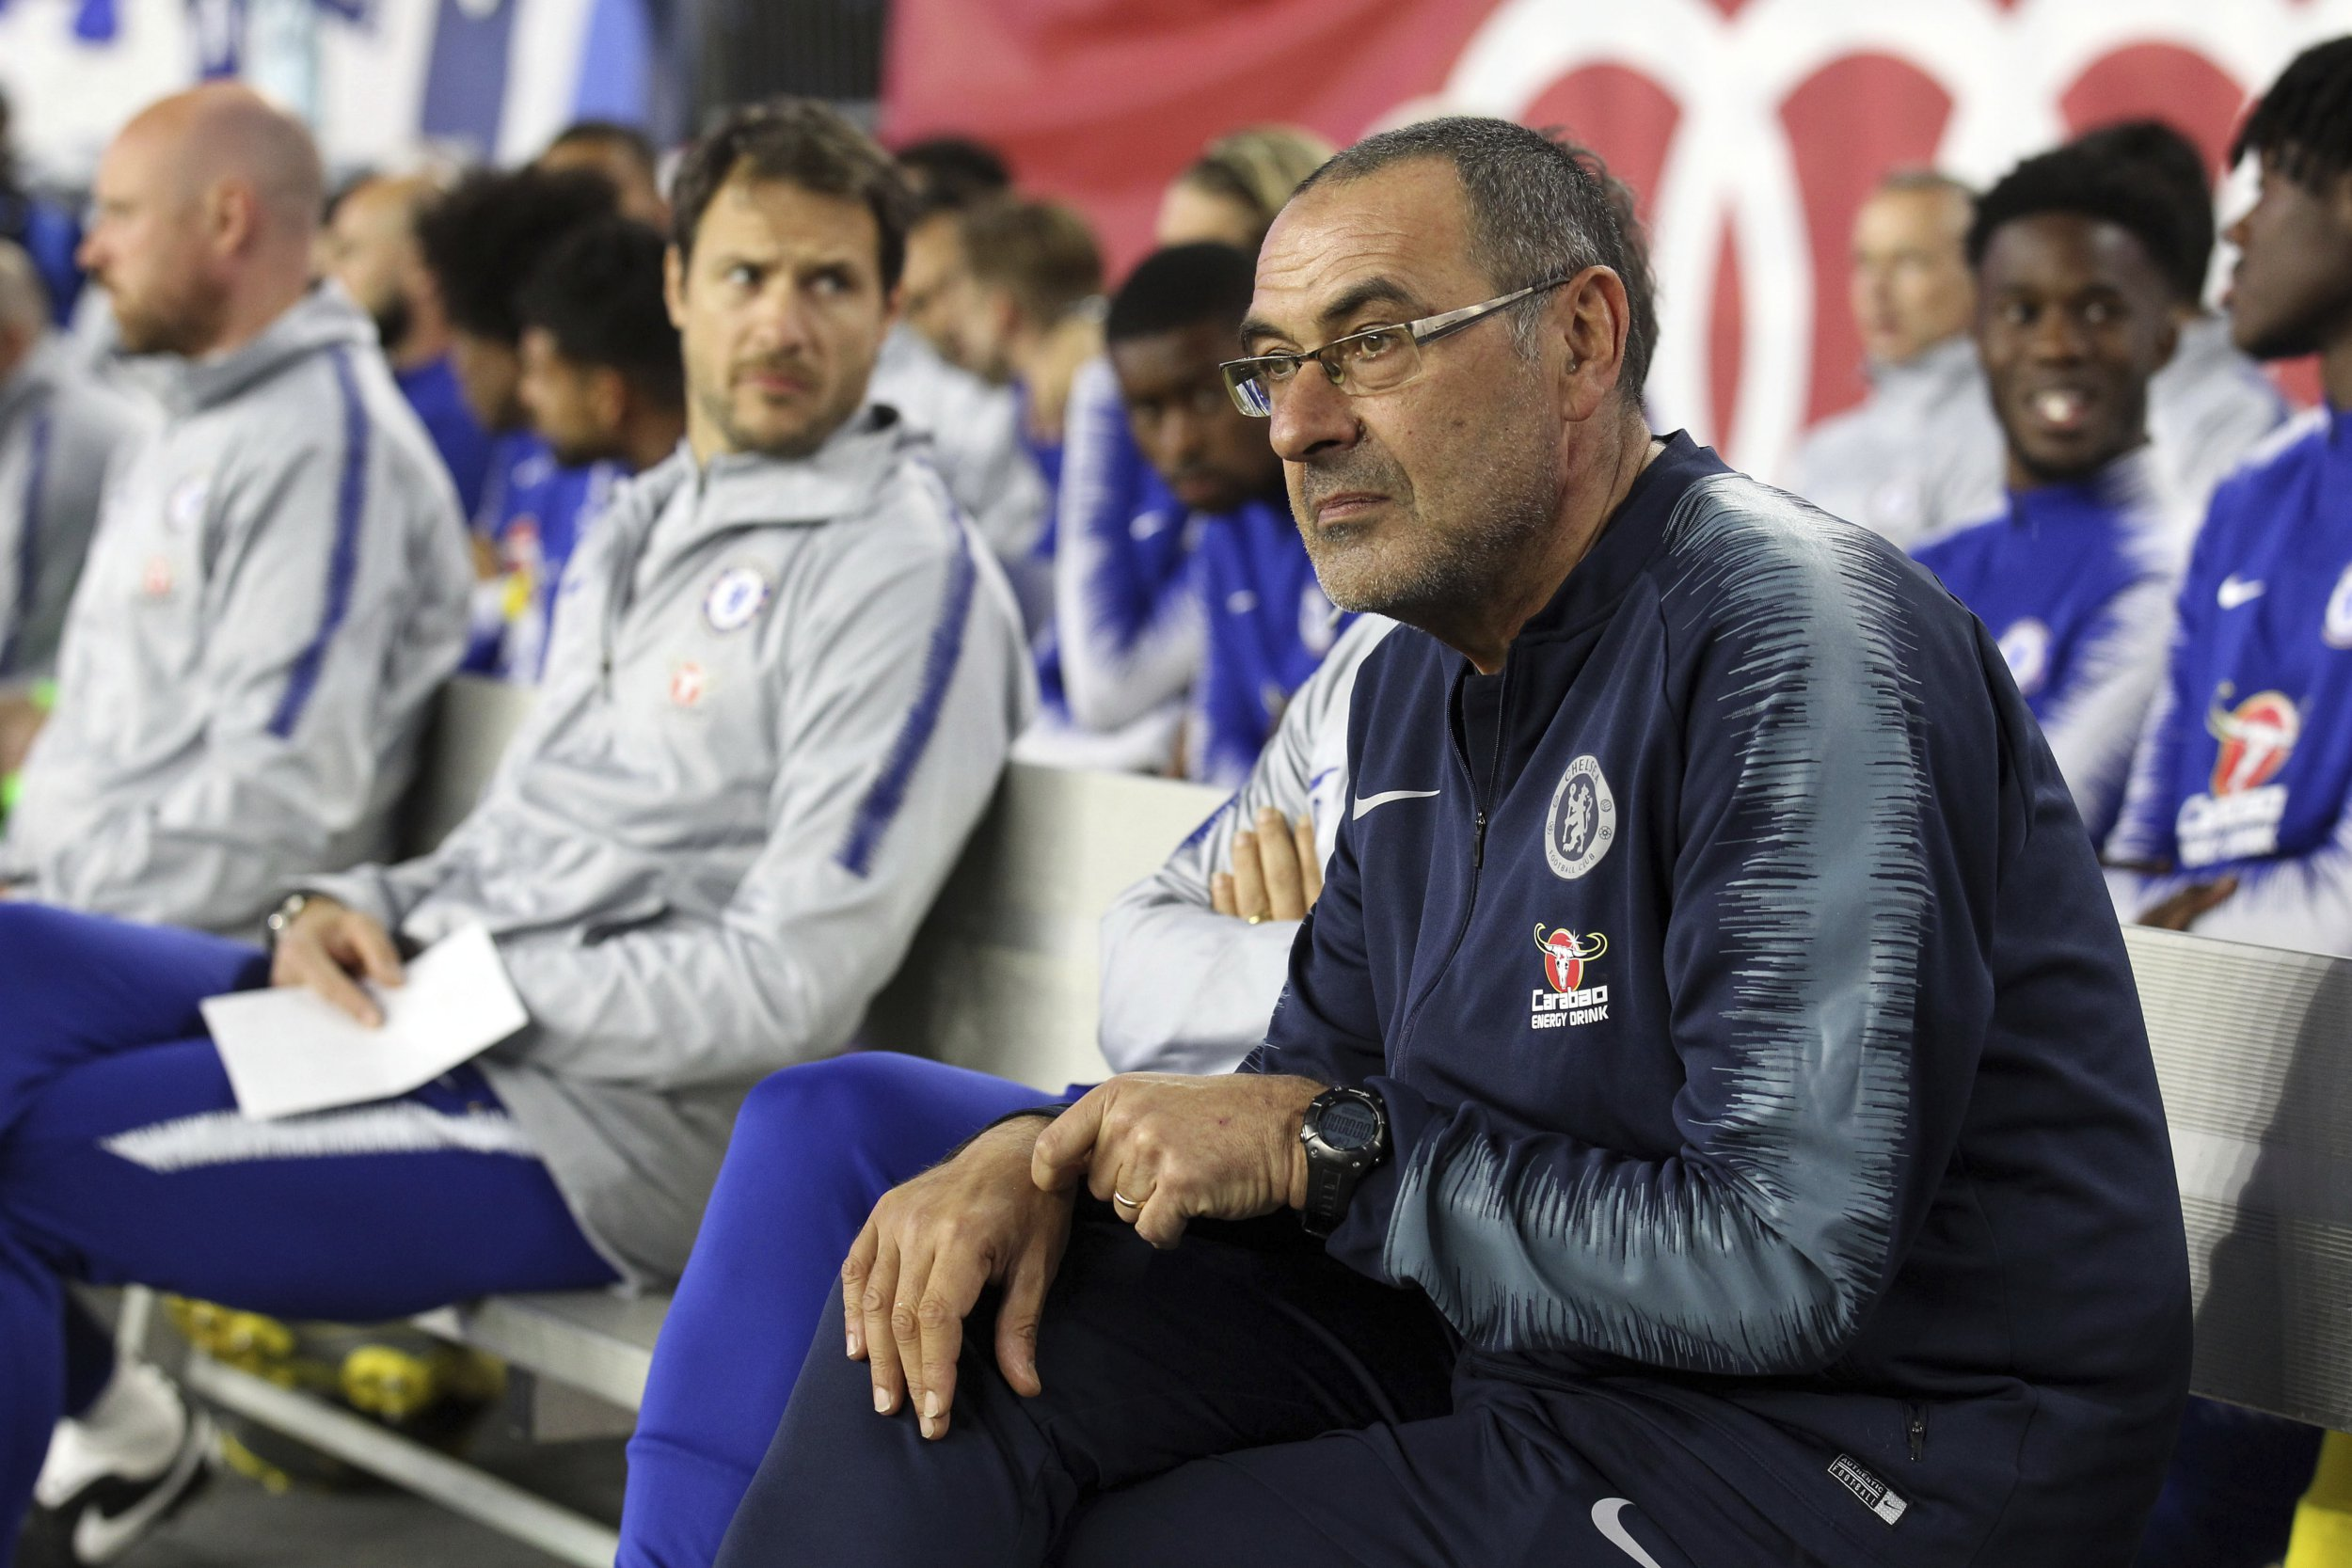 Maurizio Sarri can avoid sack if Chelsea win Europa League and transfer ban upheld